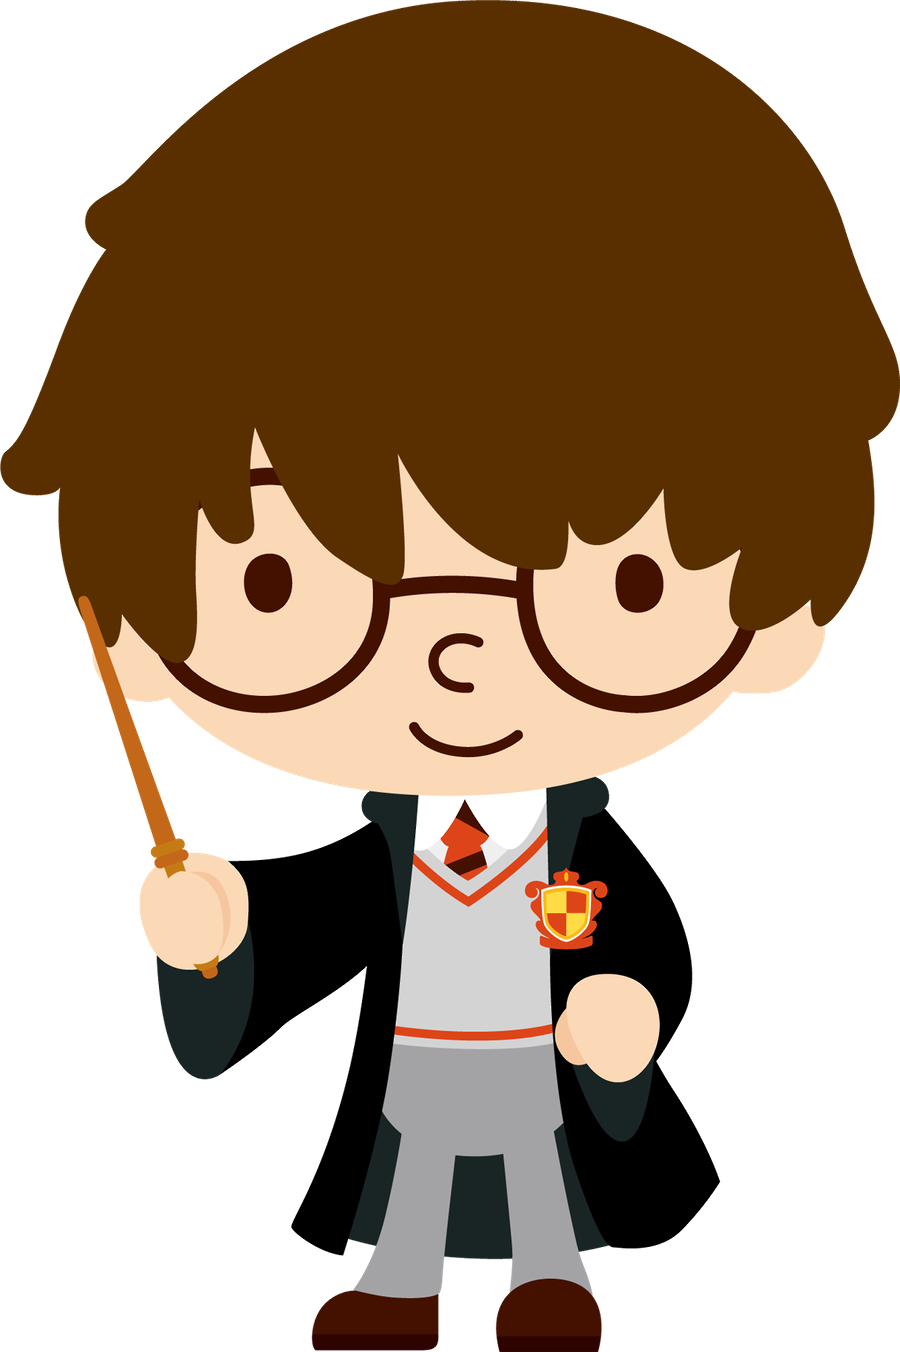 Harry Potter - Minus | clipart - harry potter/ magician ...